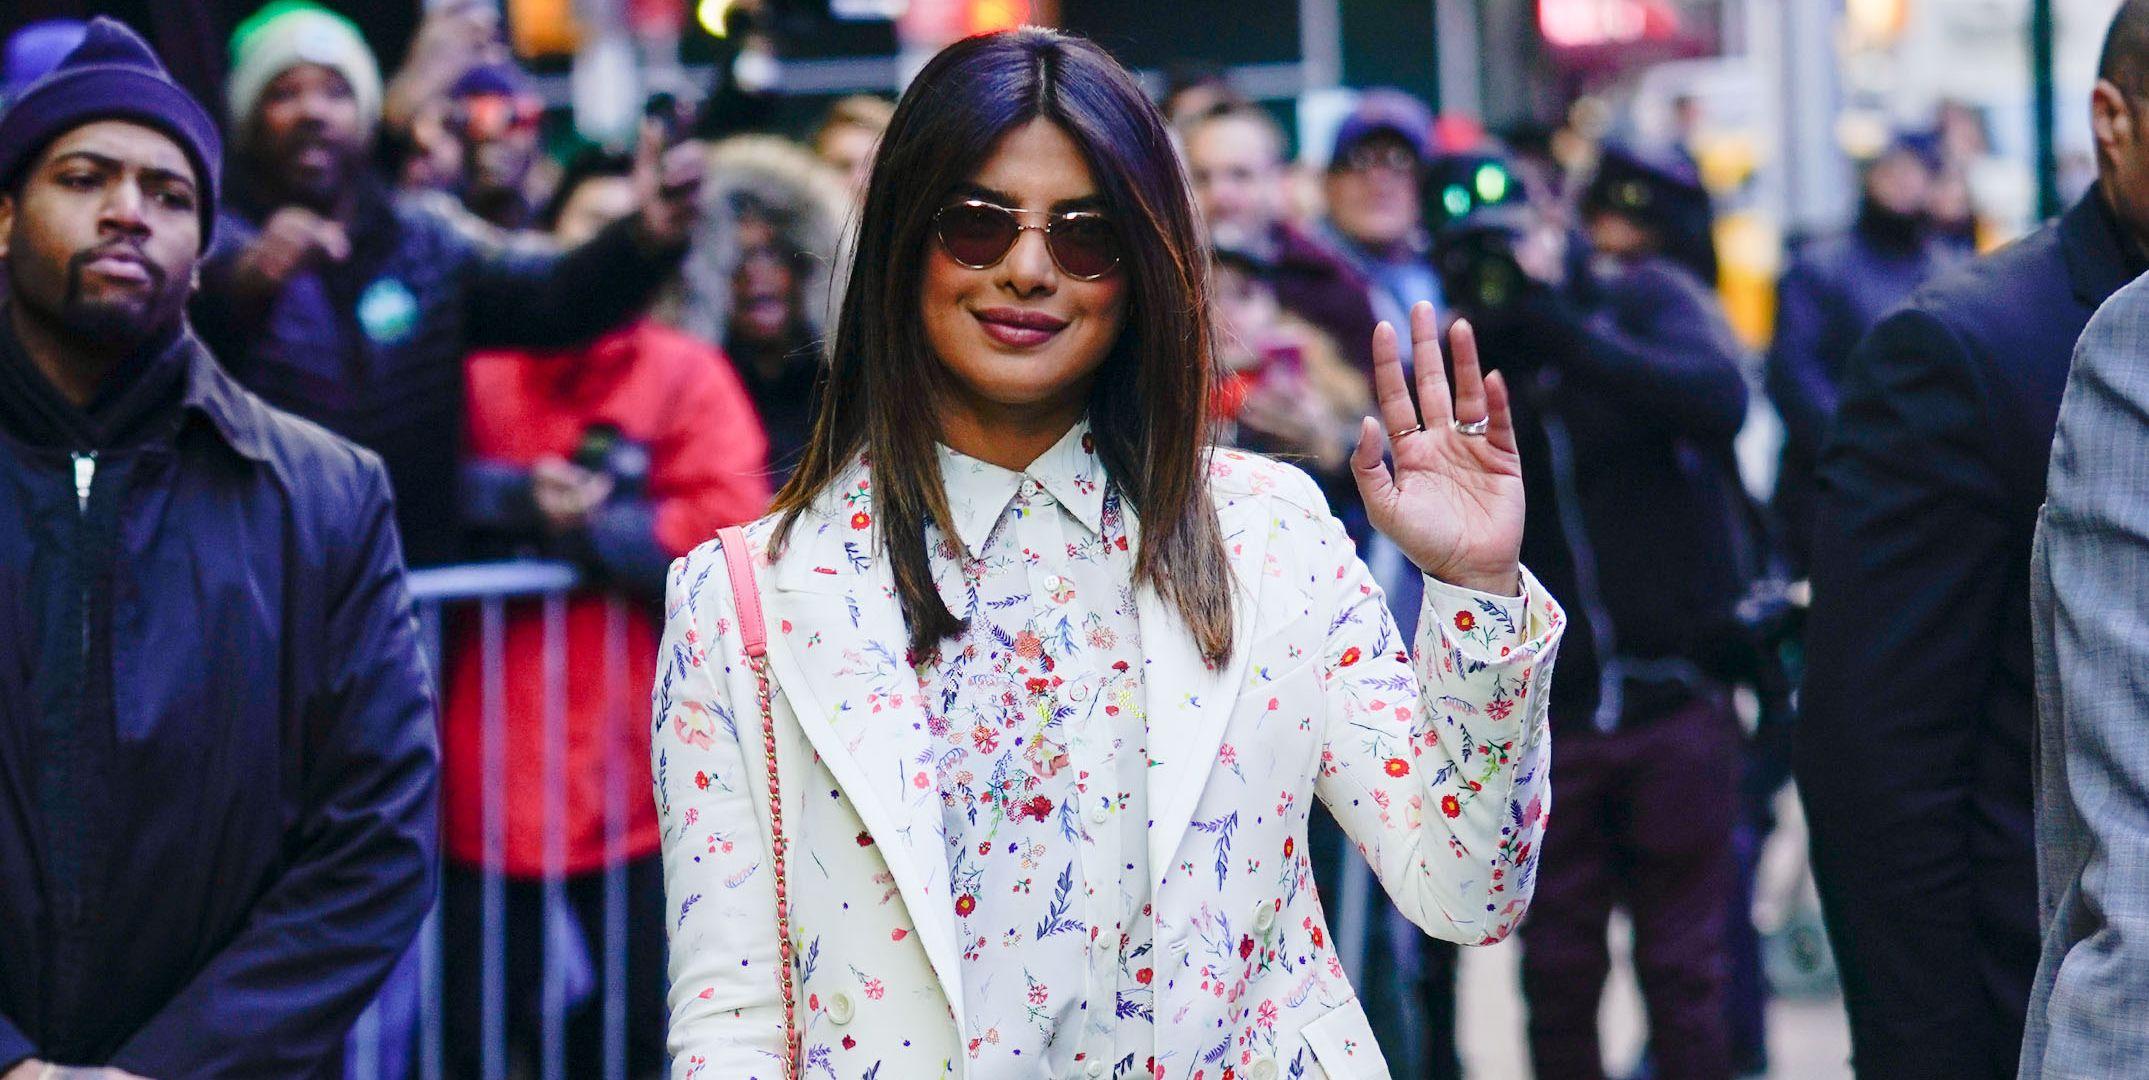 Celebrity Sightings In New York City - February 06, 2019